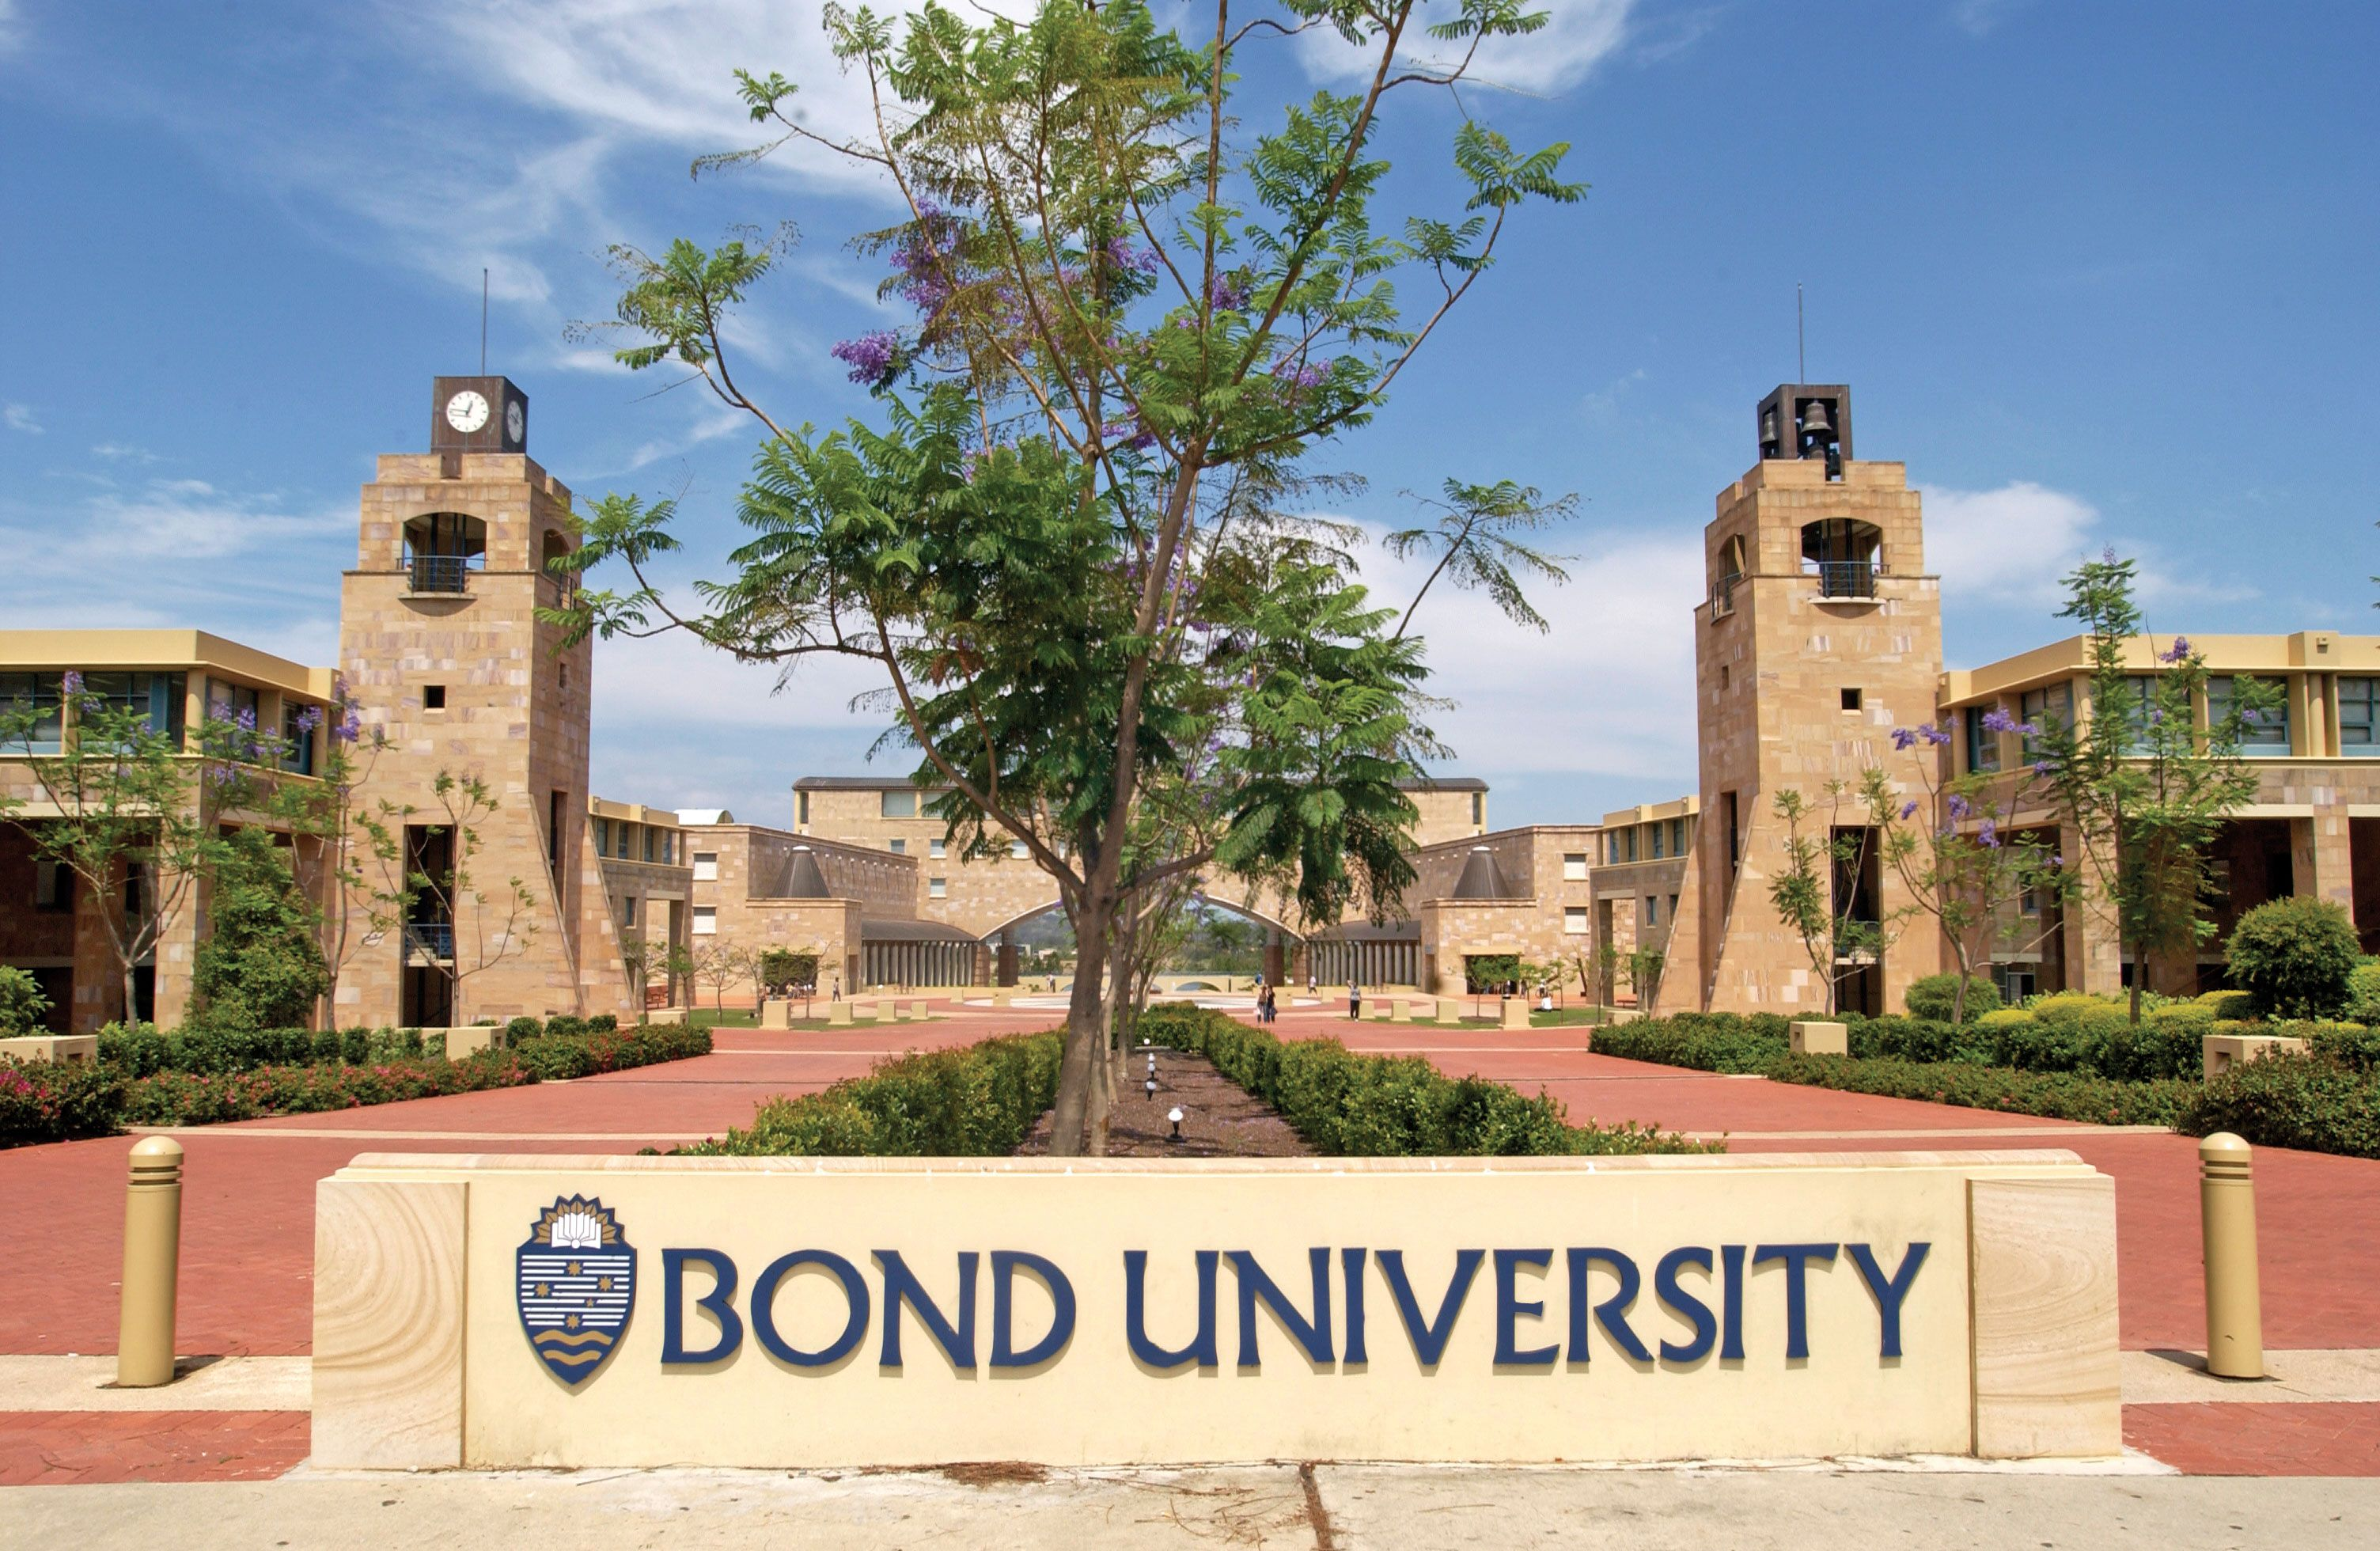 Bond University Campusgold Coastone Of Australias Best Hijab By Nobby Mumtaz Dress Universitiesand Ten Minutes From Great Surf Beaches